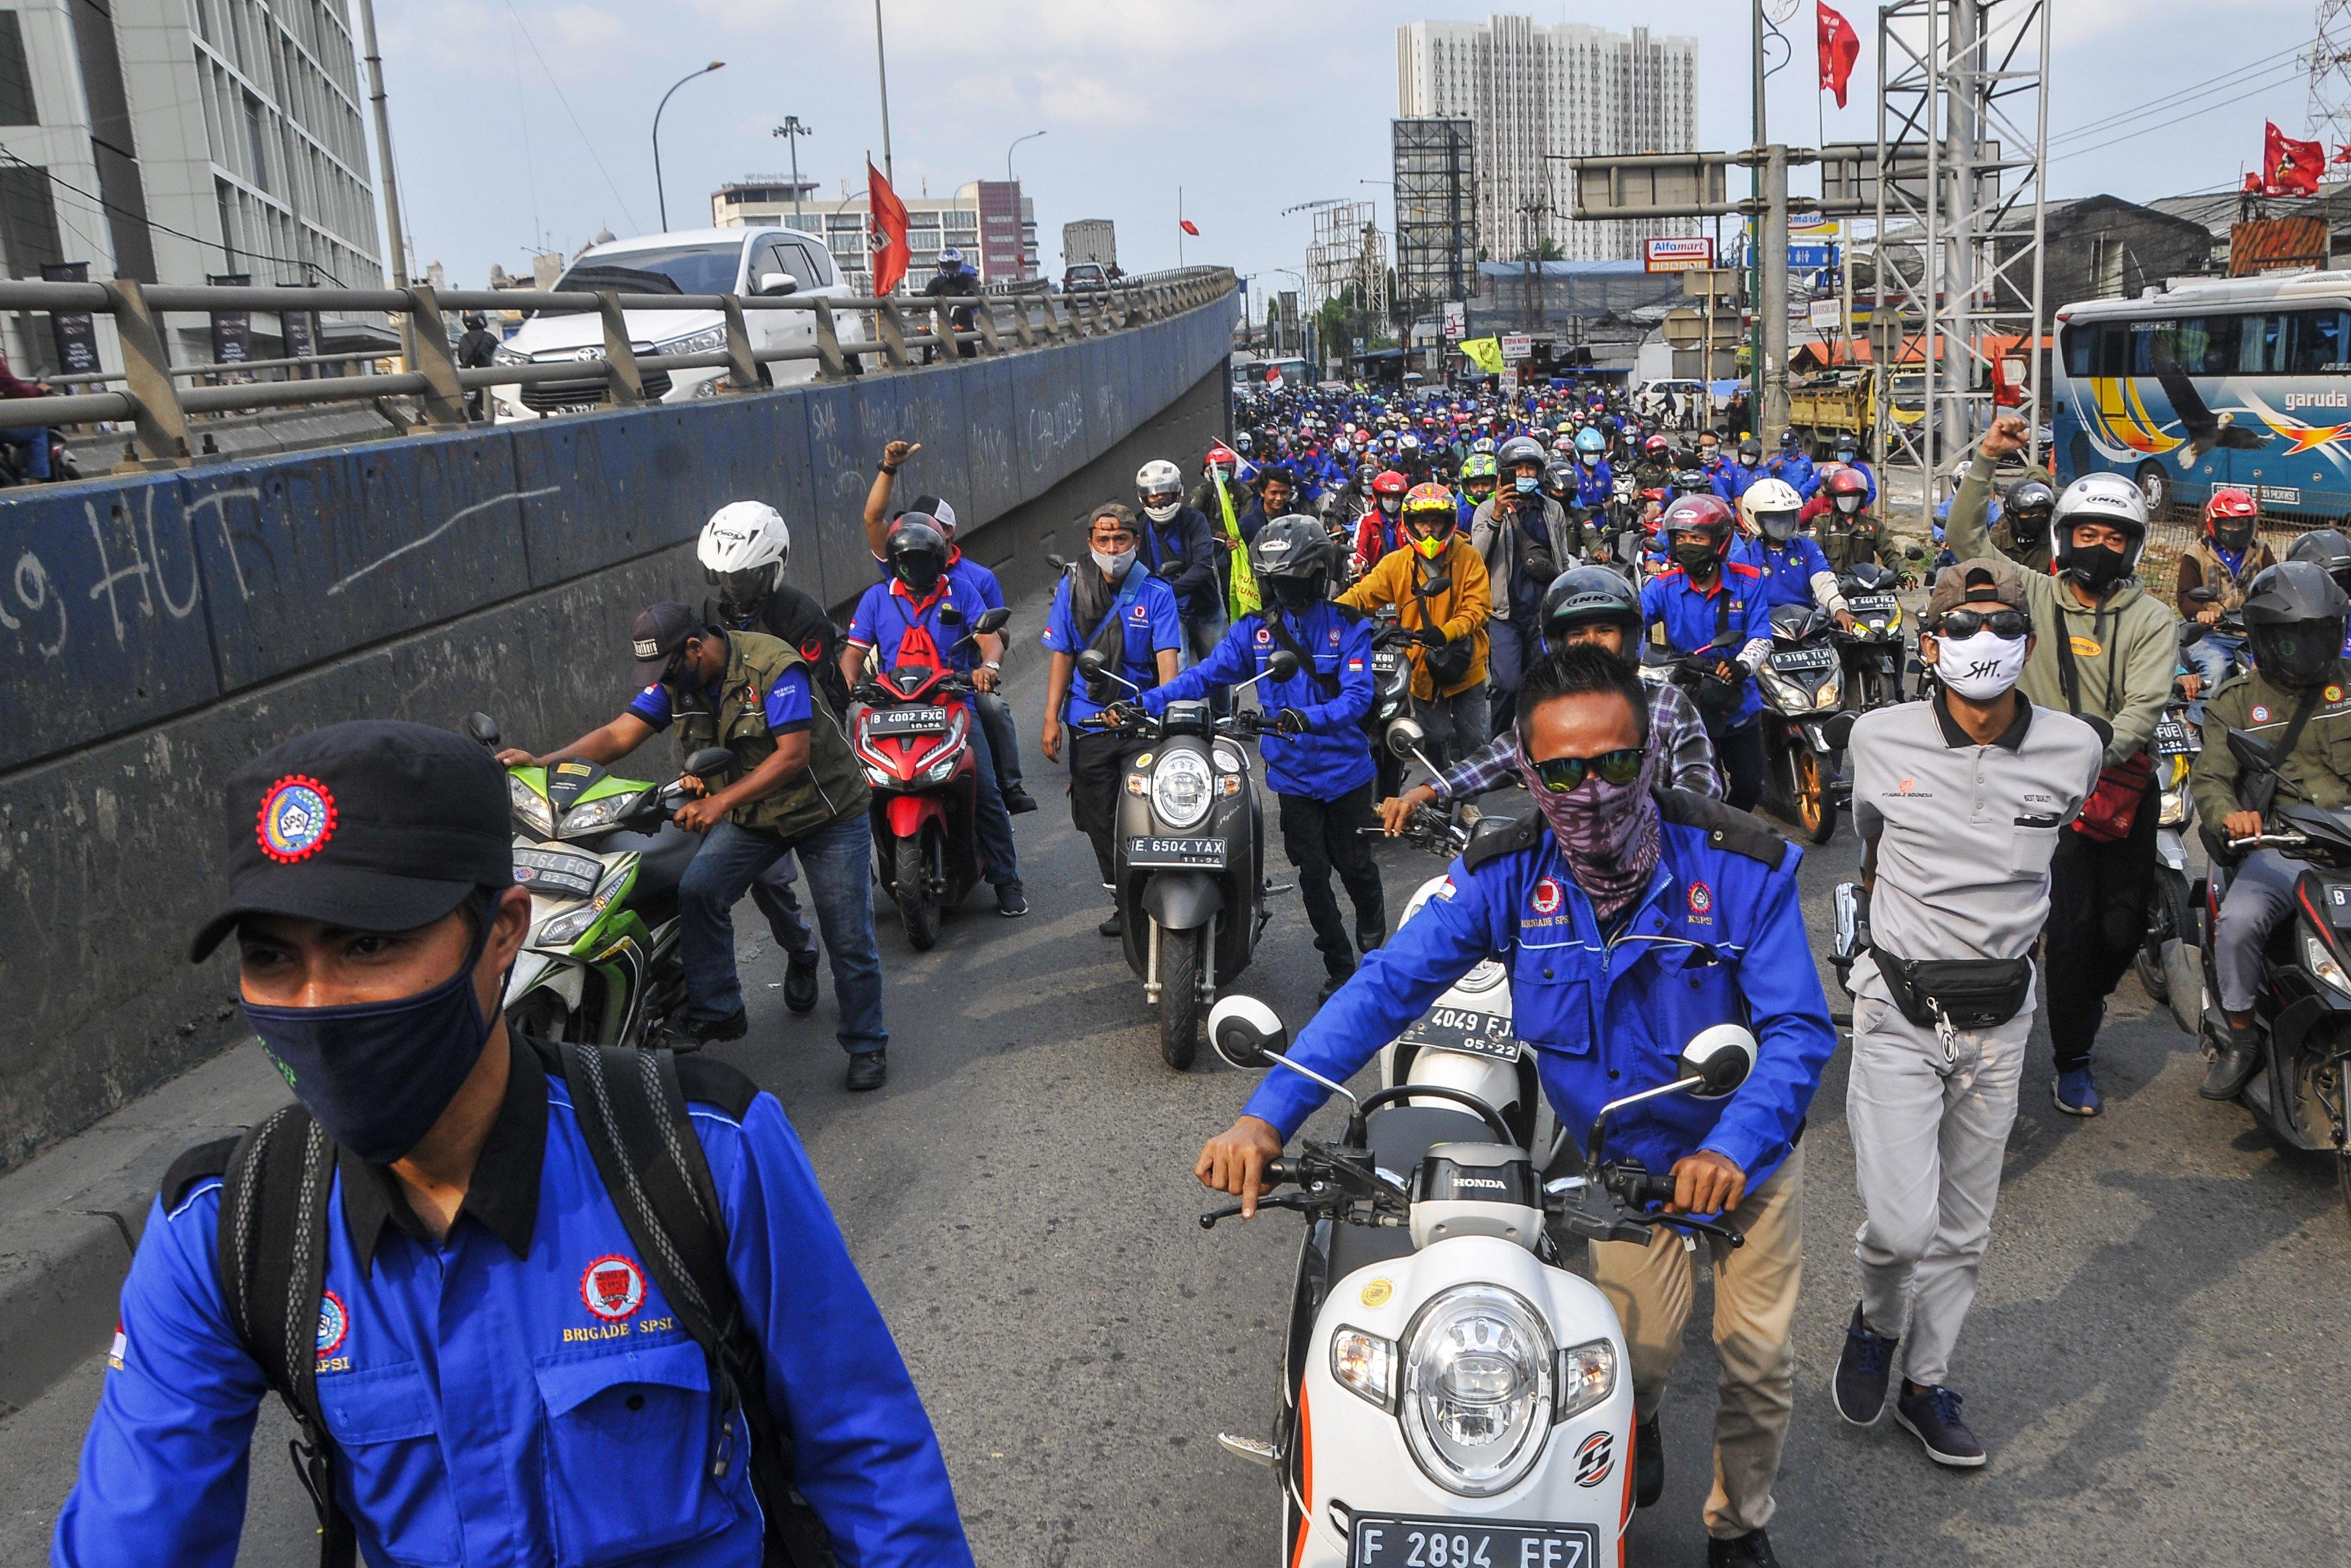 Sejumlah buruh dari berbagai aliansi menggelar aksi dorong motor di Jalan raya Cikarang-Cibarusah, Kabupaten Bekasi, Jawa Barat, Selasa (6/10/2020). Aksi tersebut sebagai kekecewaan buruh atas pengesahan Undang-Undang Cipta Kerja oleh DPR.